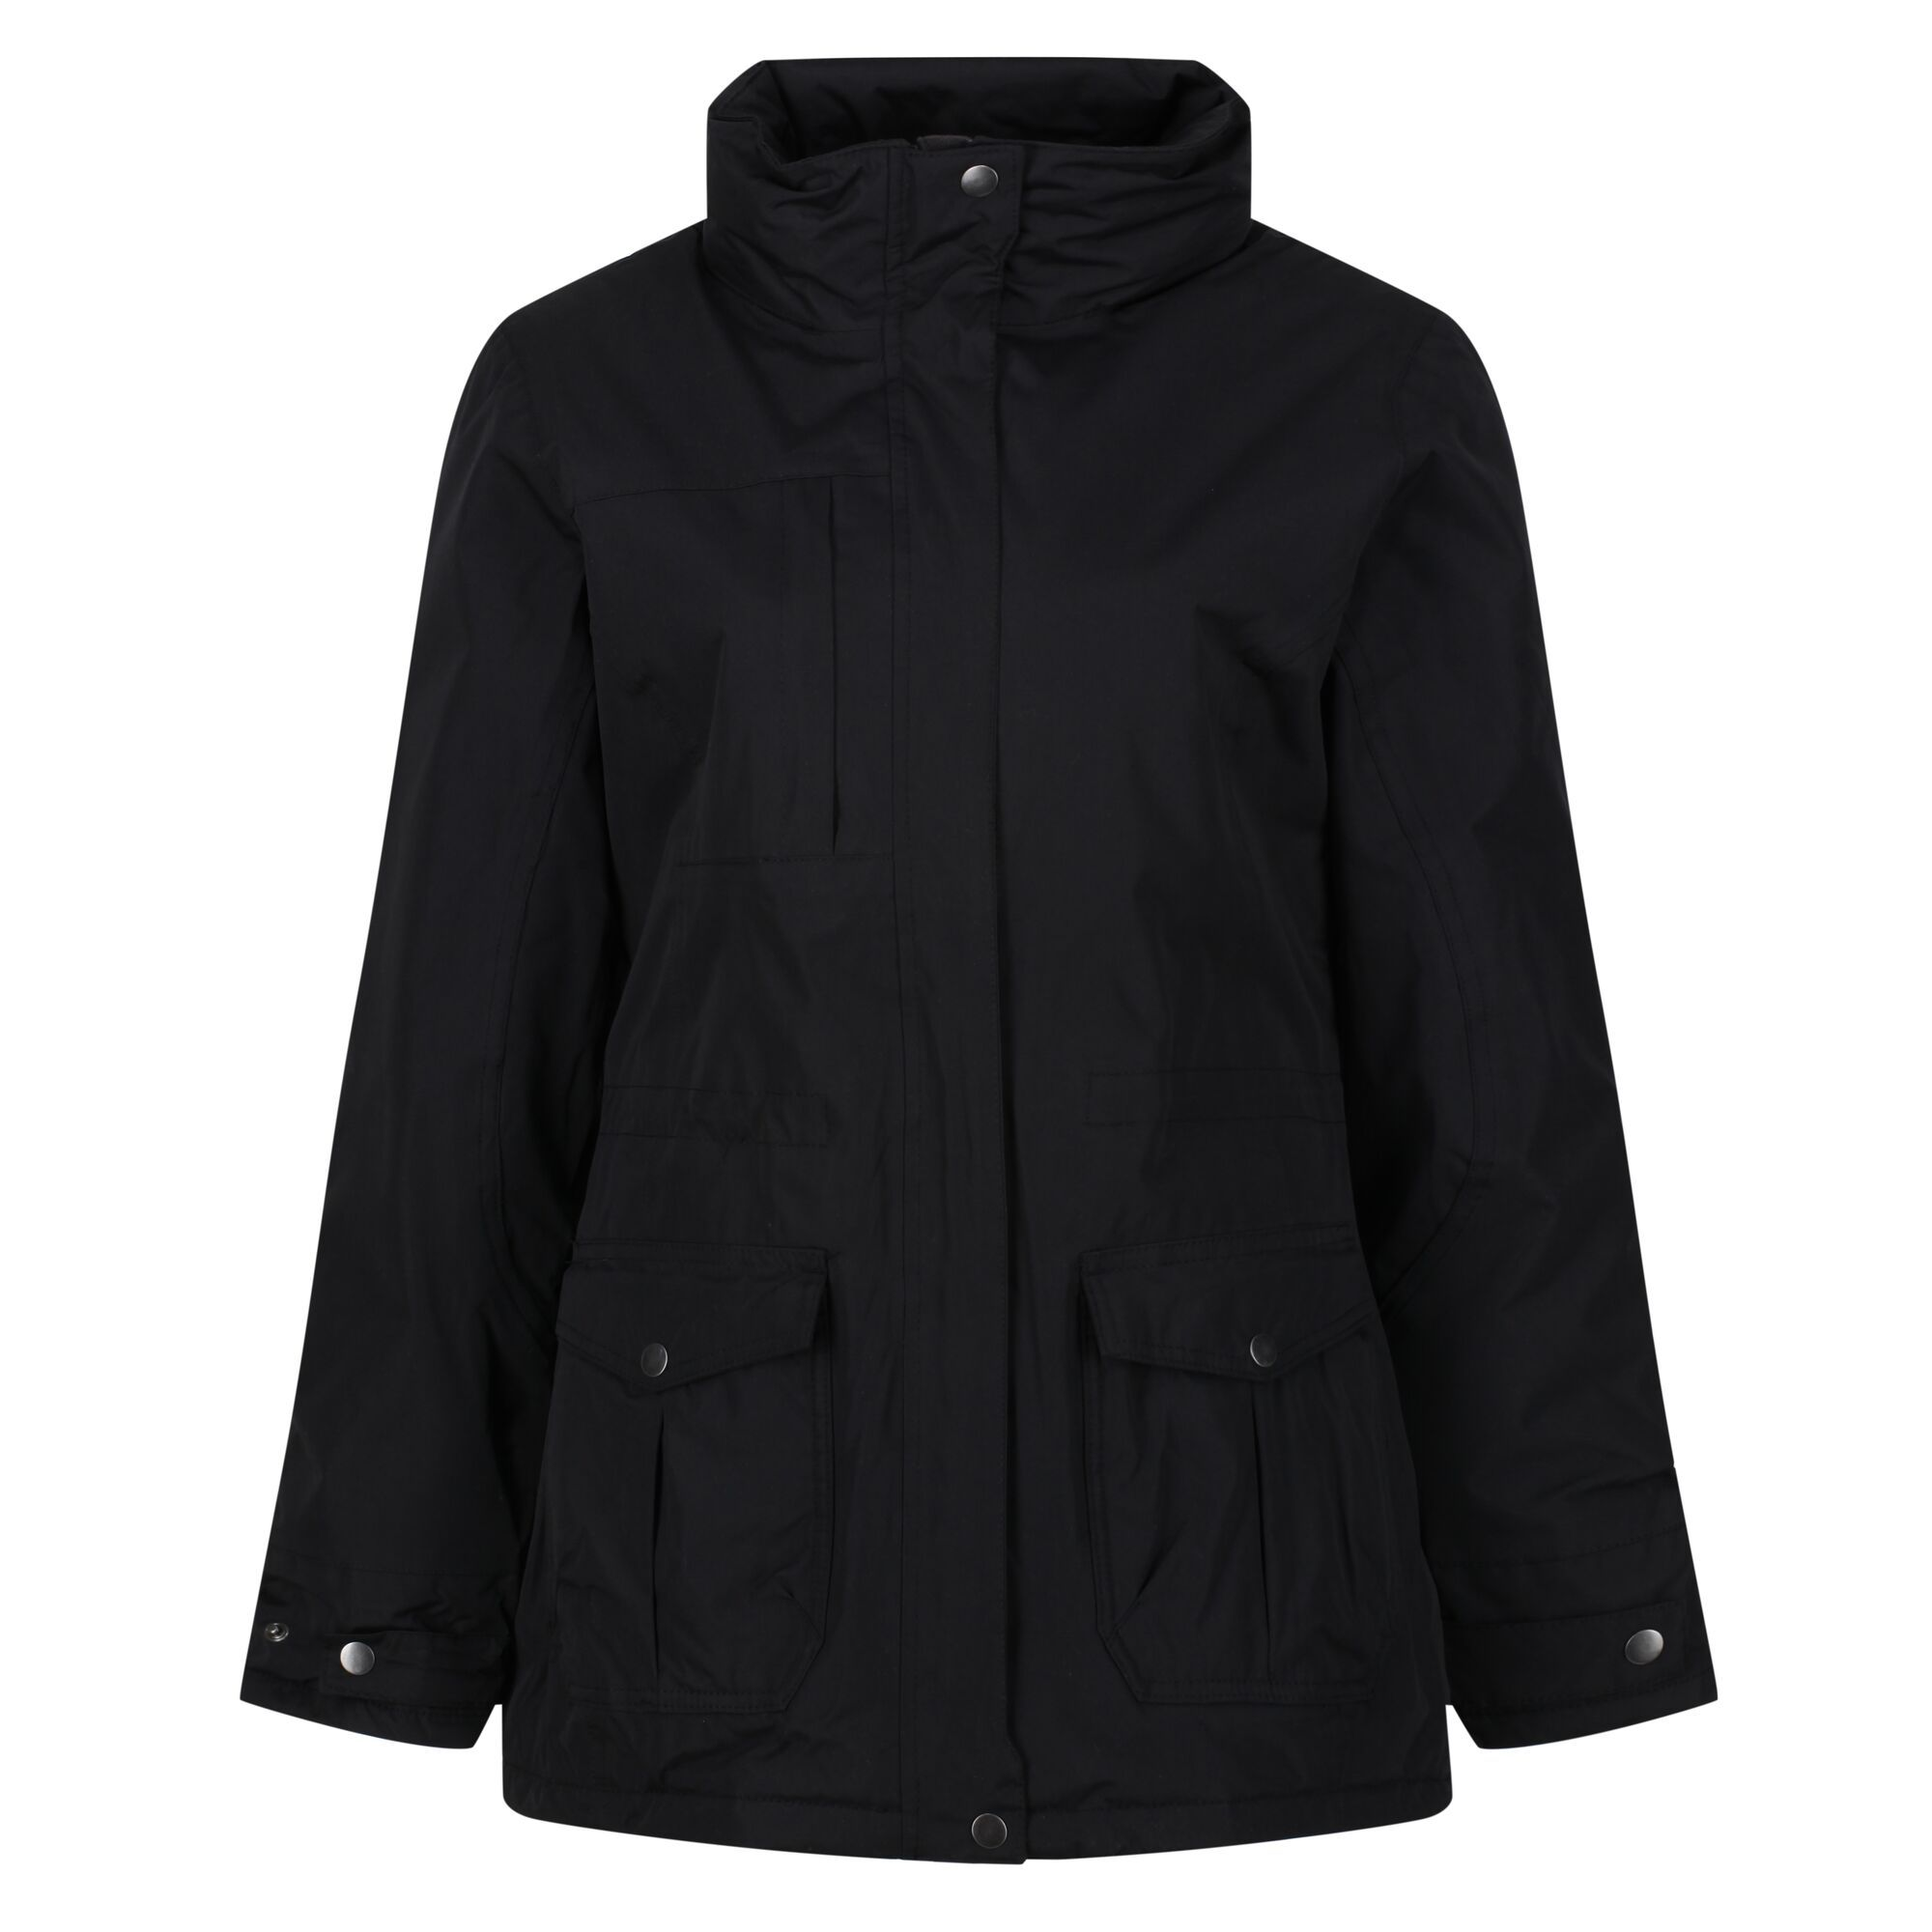 Regatta Womens/Ladies Darby Insulated Jacket (10 UK) (Black)